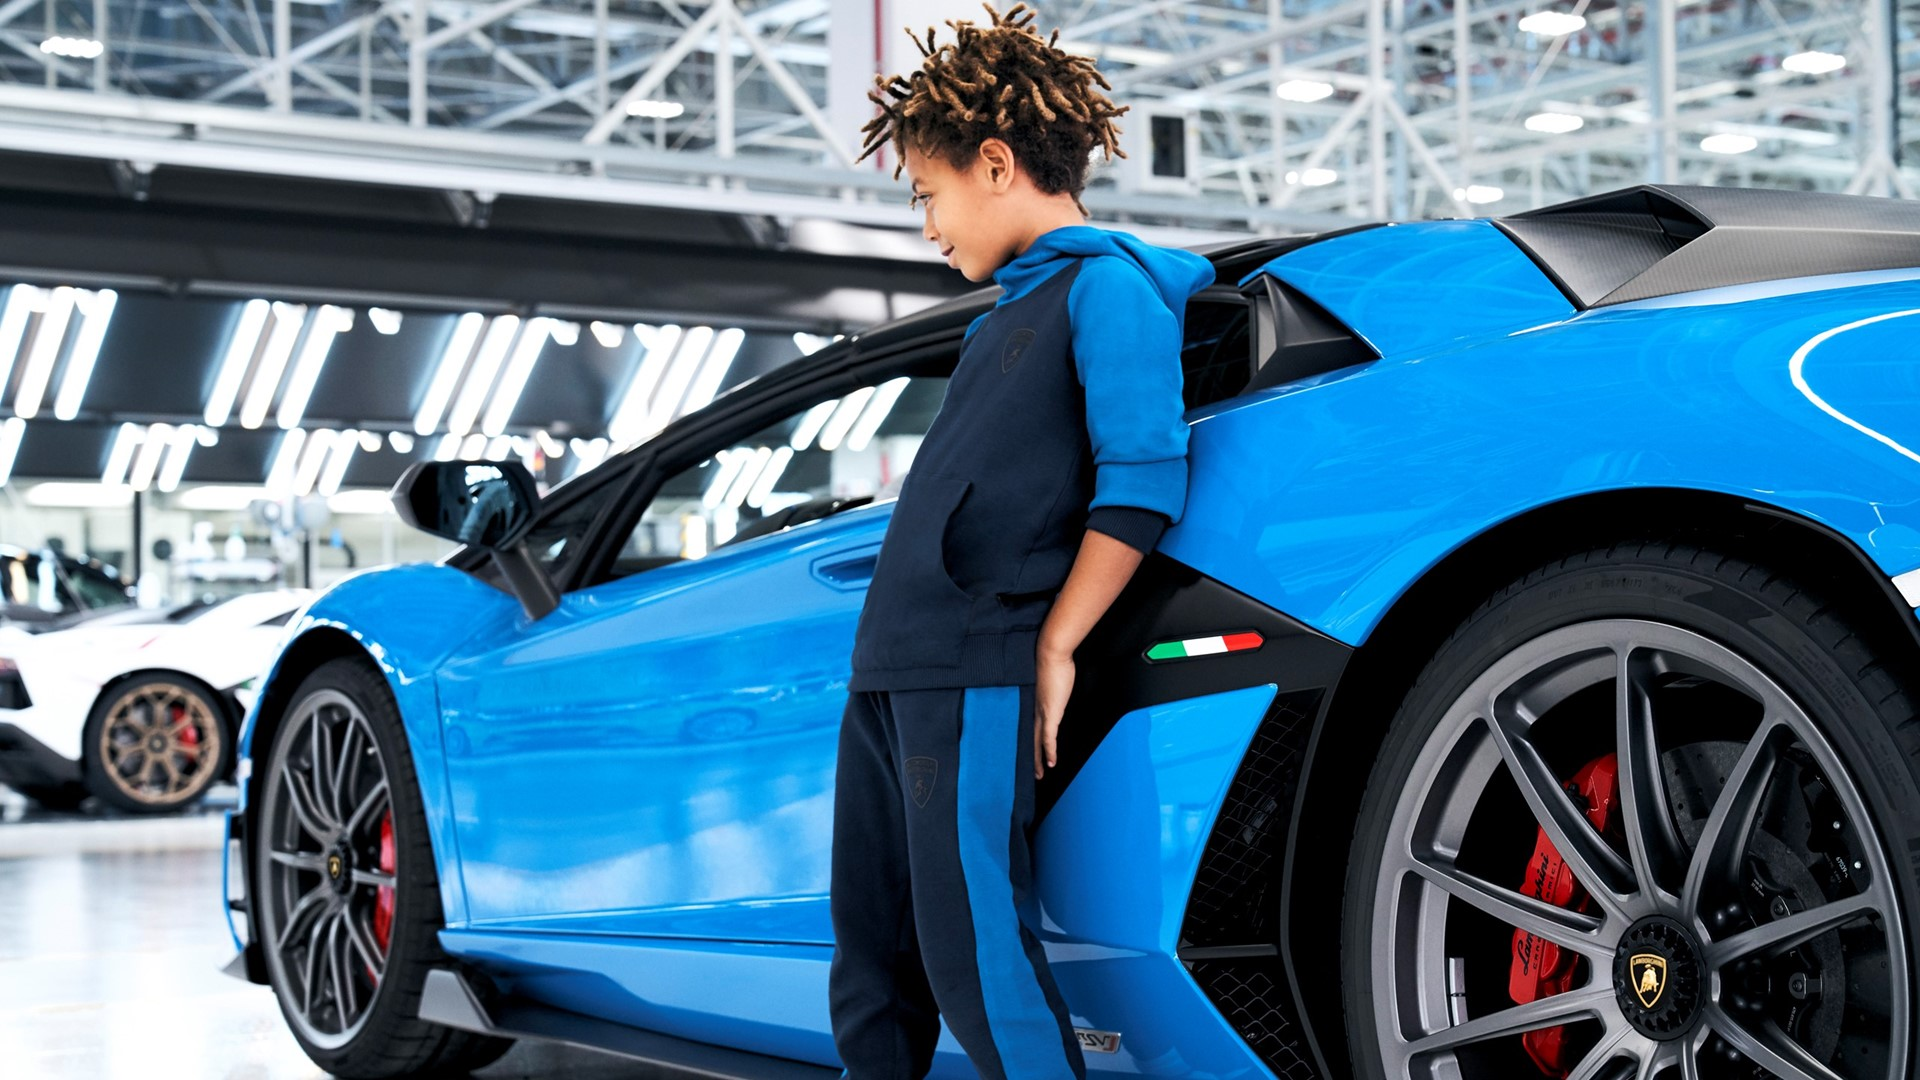 Automobili Lamborghini and KABOOKI confirm kidswear licensing agreement - Image 3